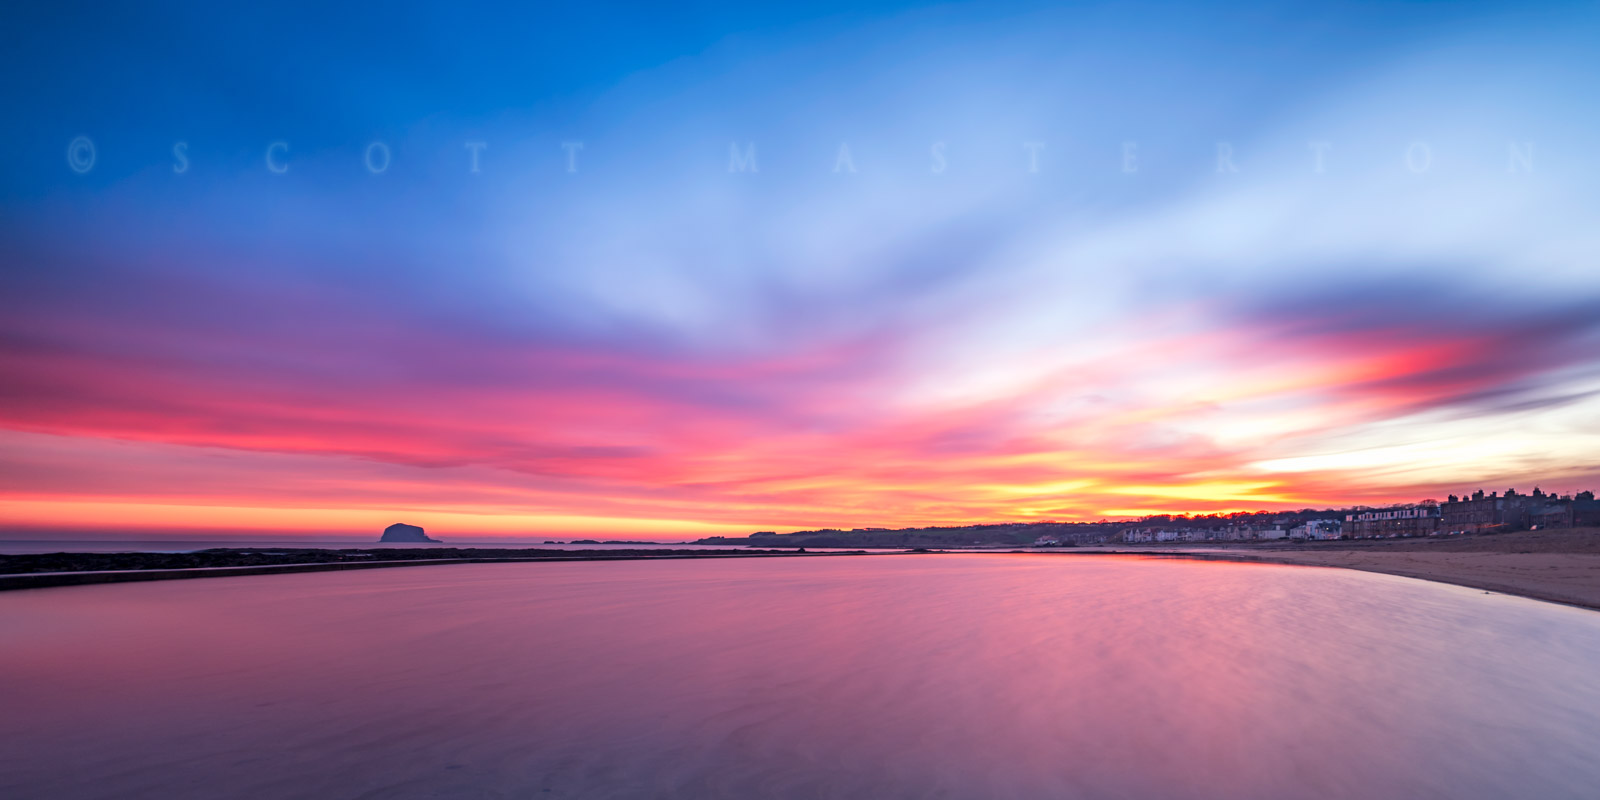 Feel the morning light | von Scott Masterton